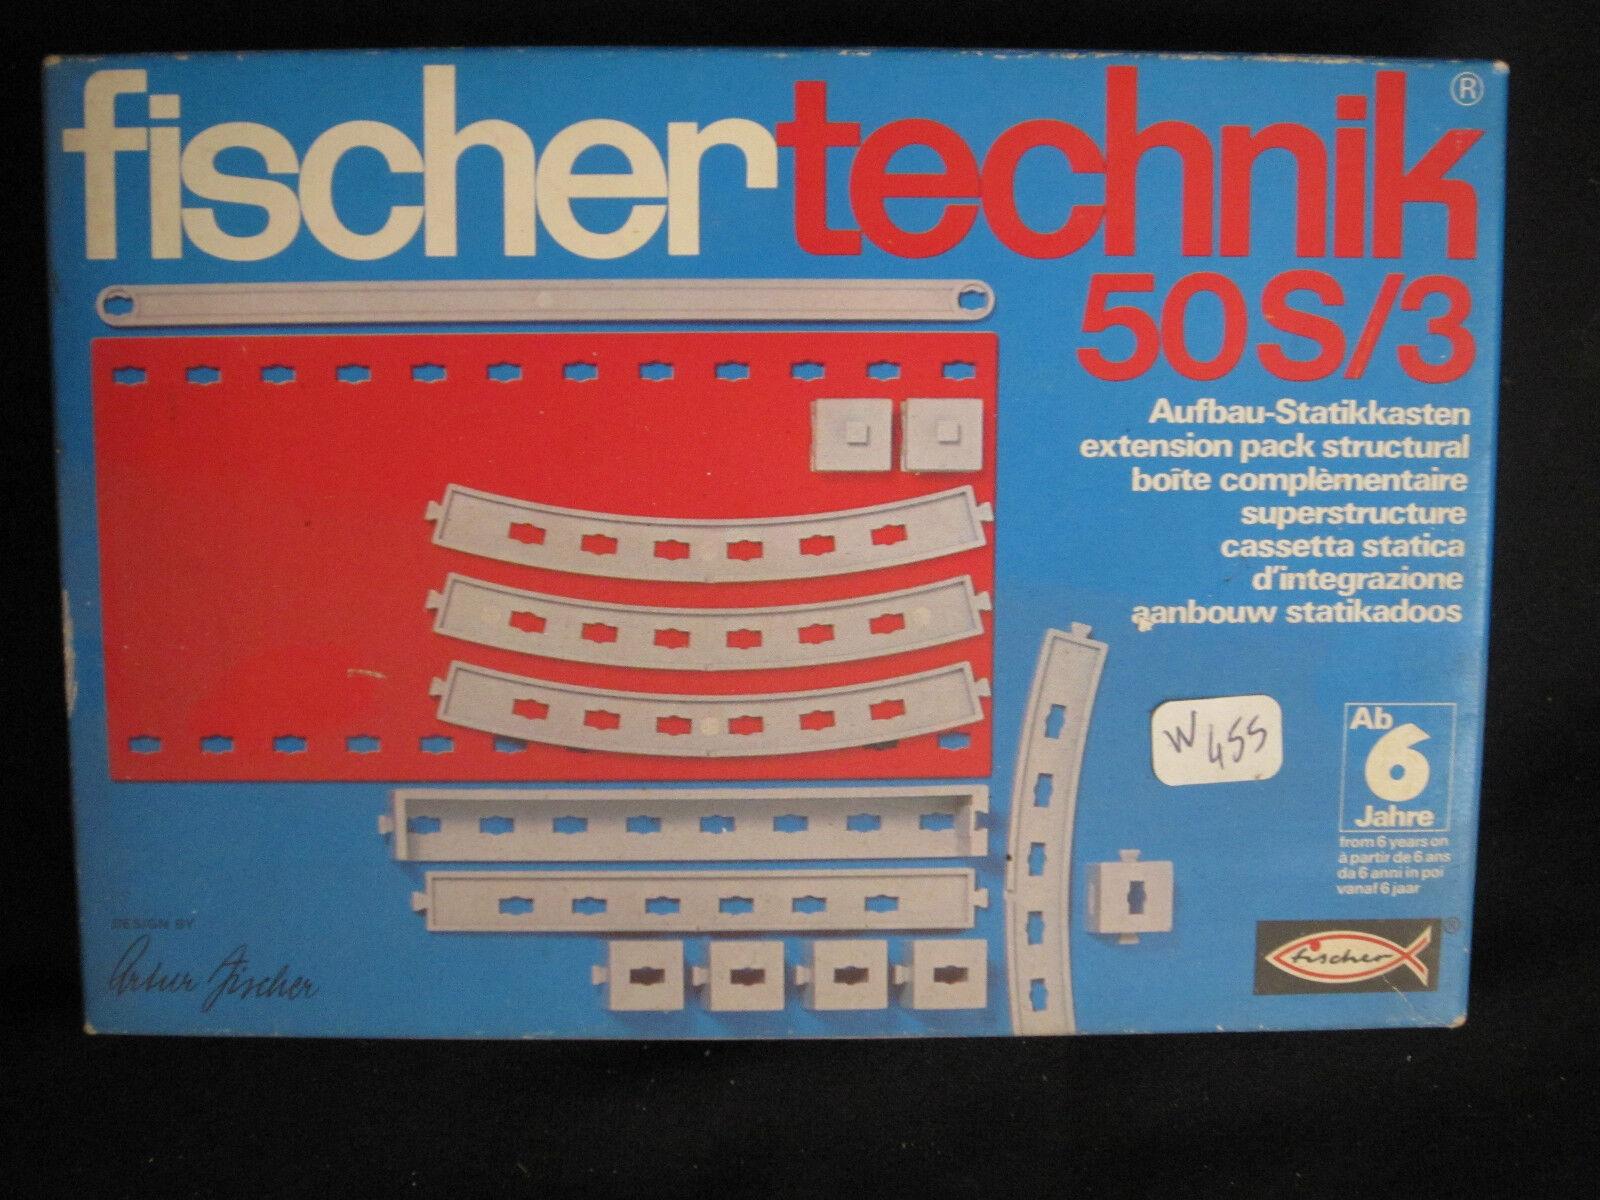 W455 FISCHER TECHNIK Réf. 50S 3 2 30162 5 TRES BON ETAT